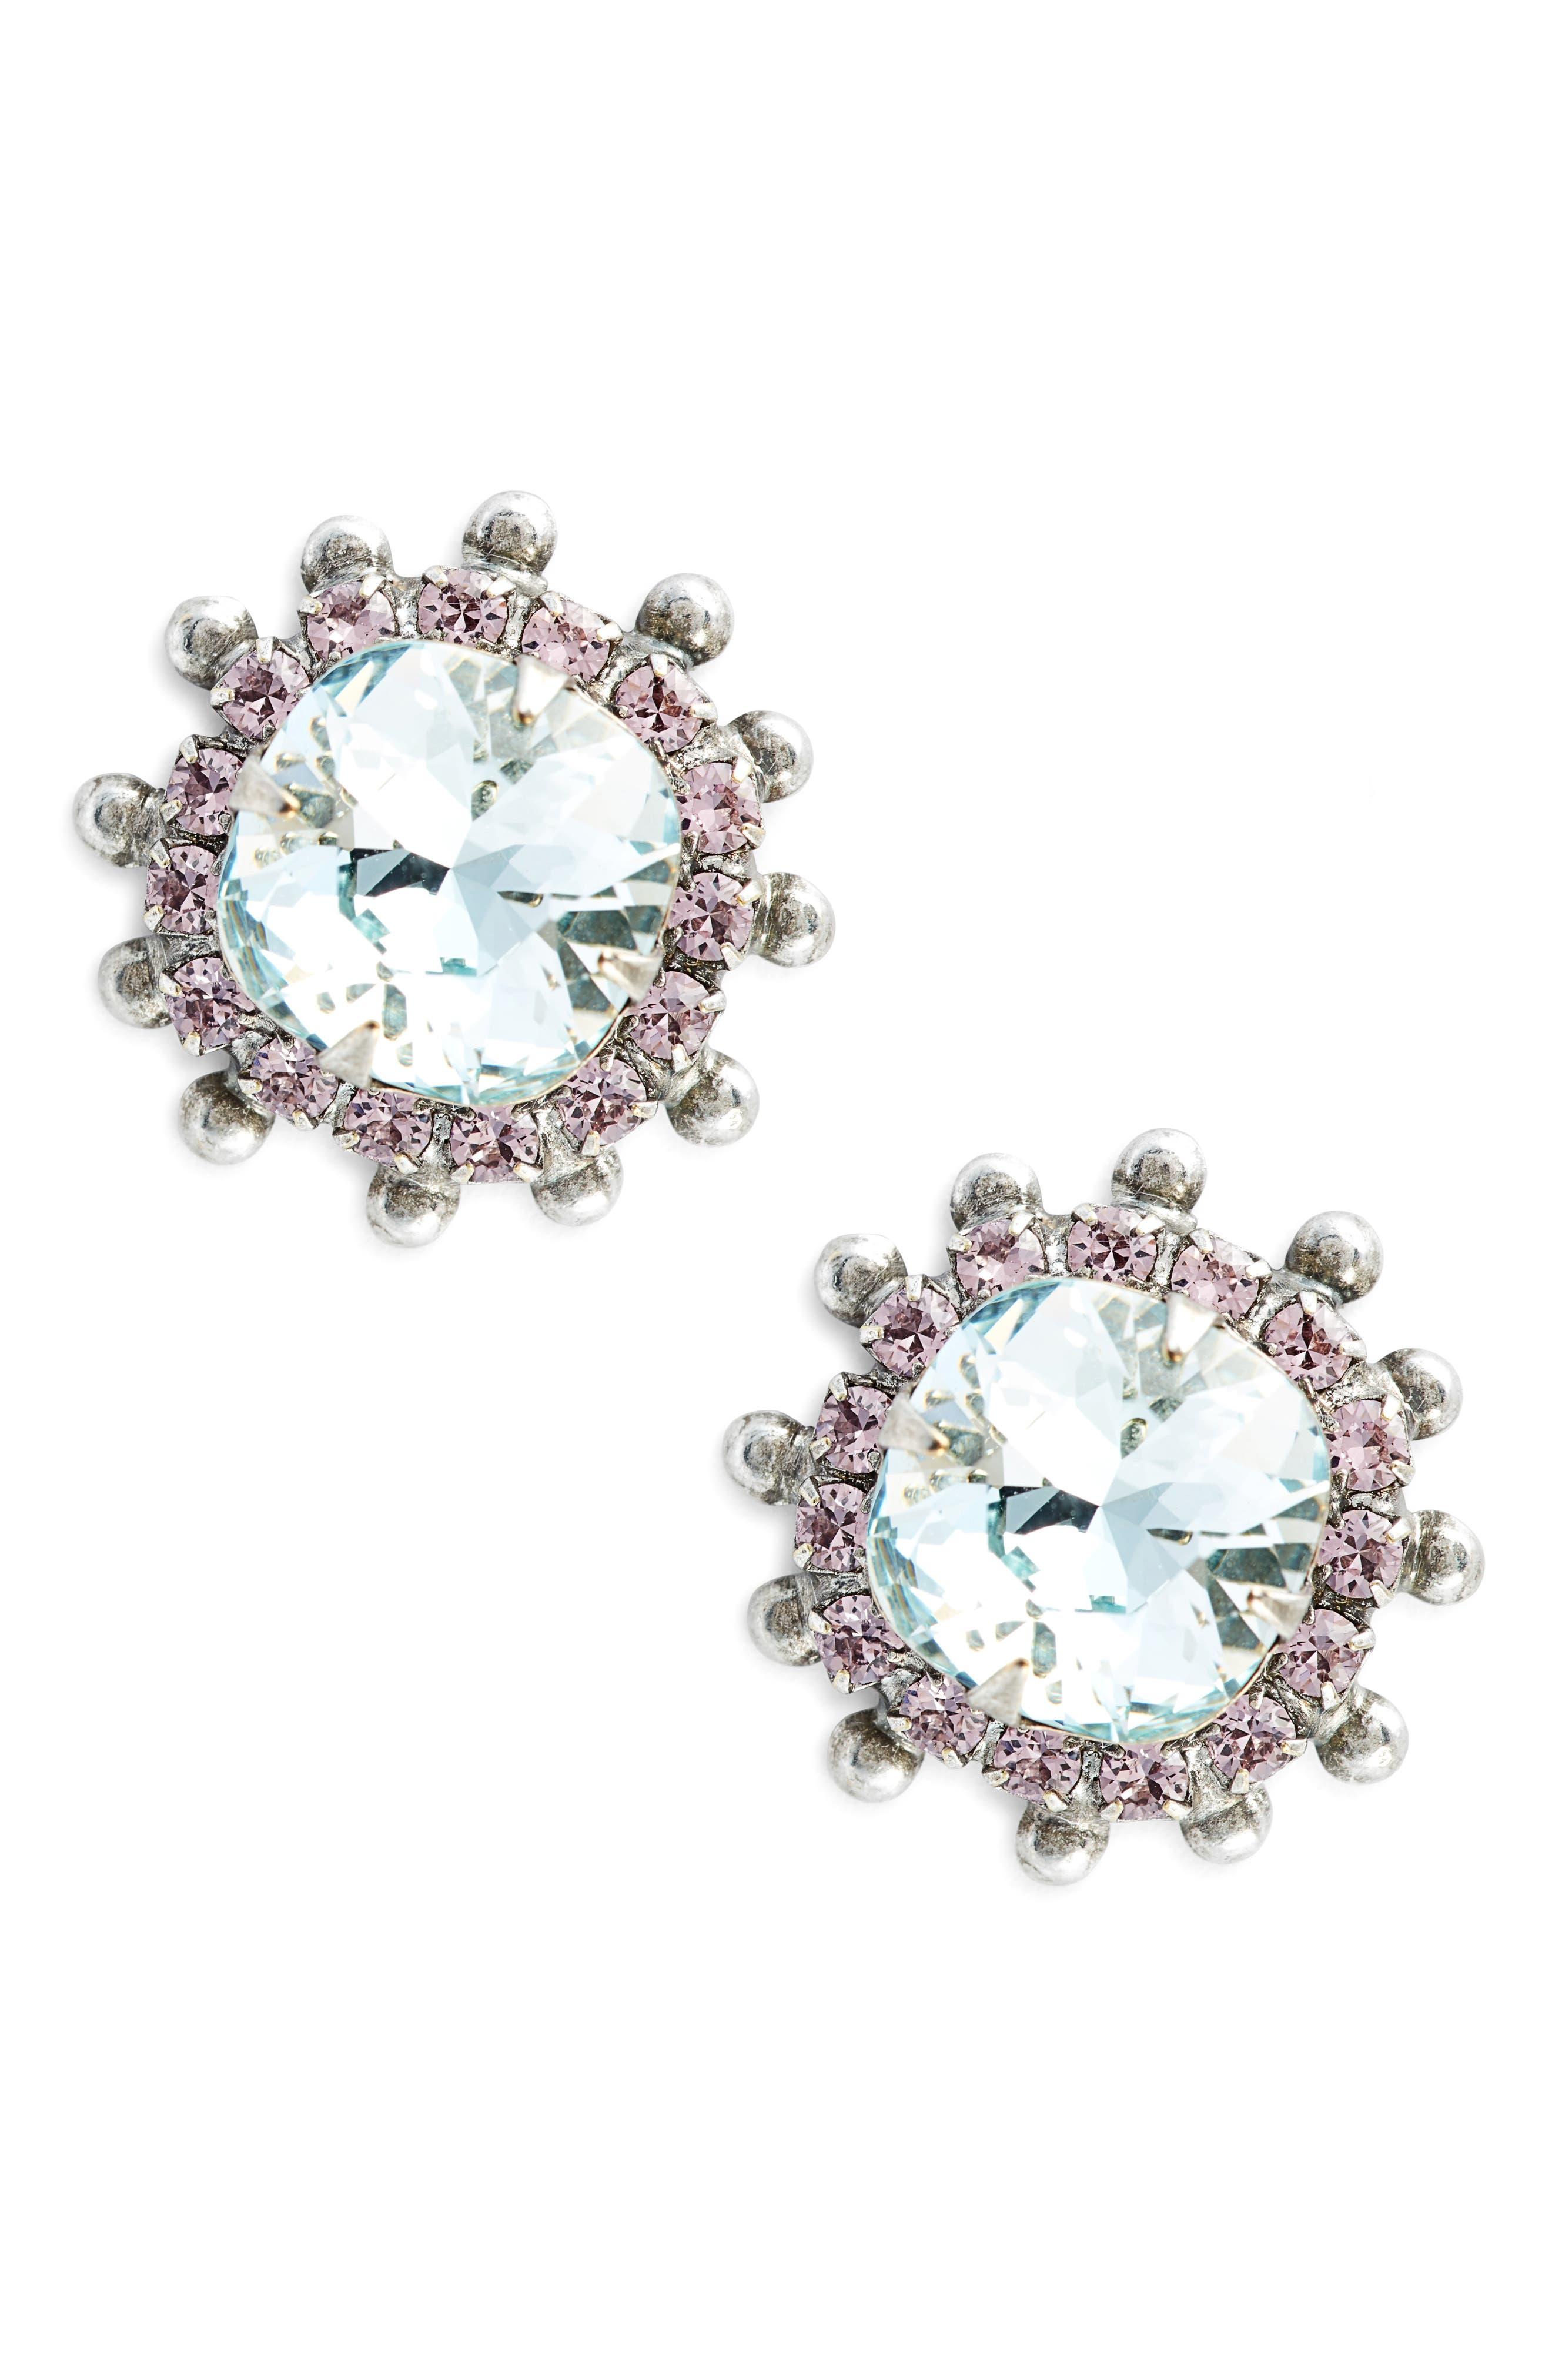 Protea Donna Crystal Earrings,                             Main thumbnail 1, color,                             401